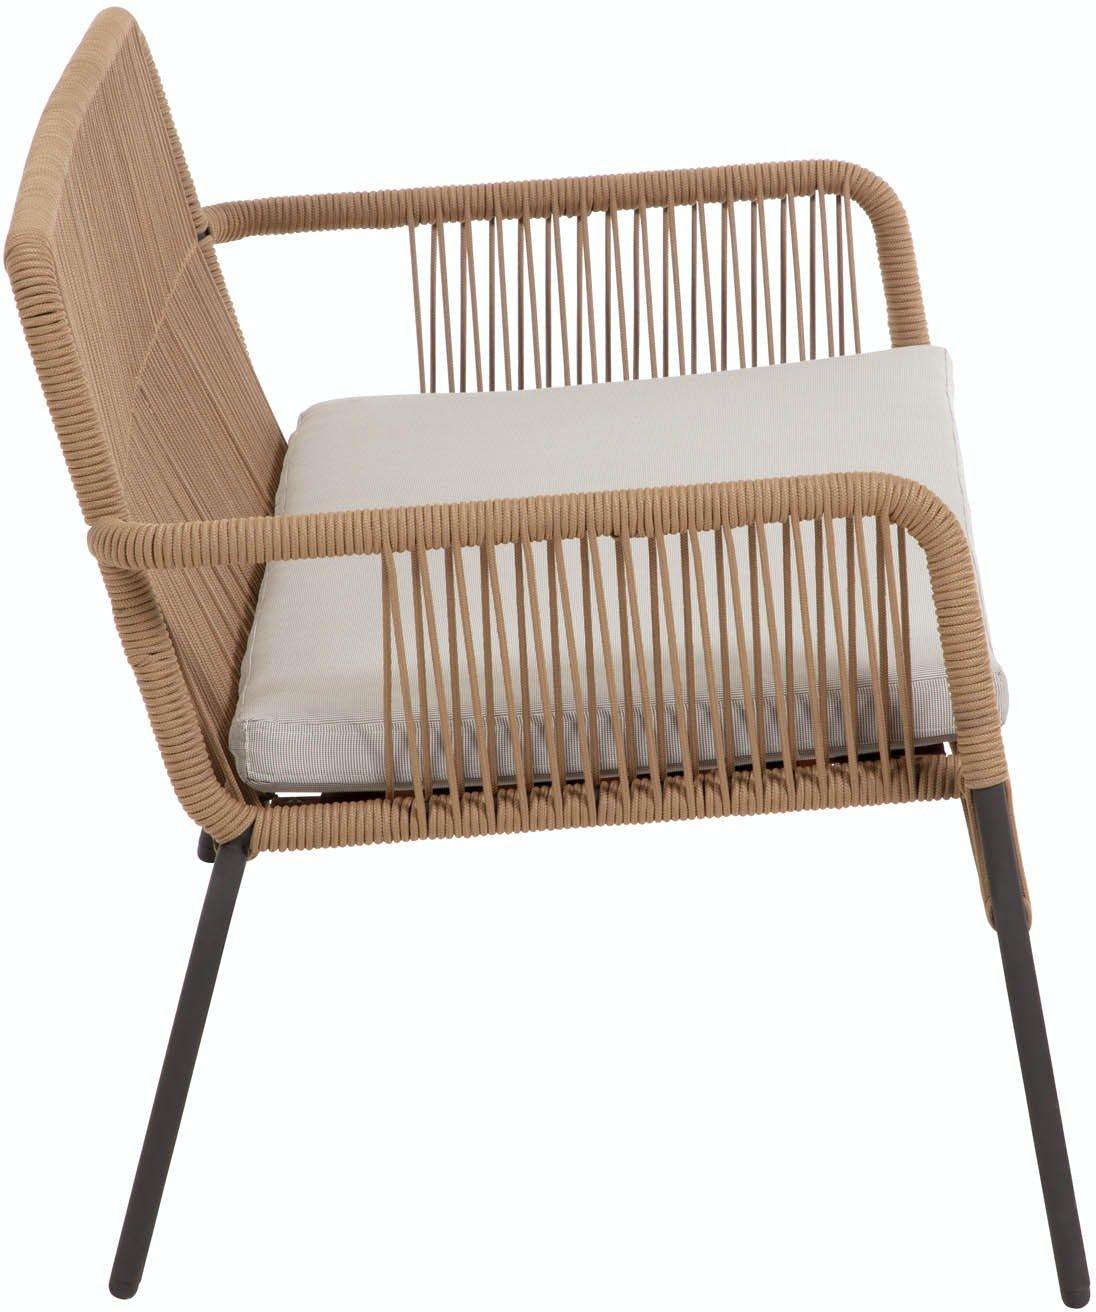 Samanta, Udendørs 2-personers sofa by LaForma (H: 73 cm. B: 133 cm. L: 73 cm., Beige)